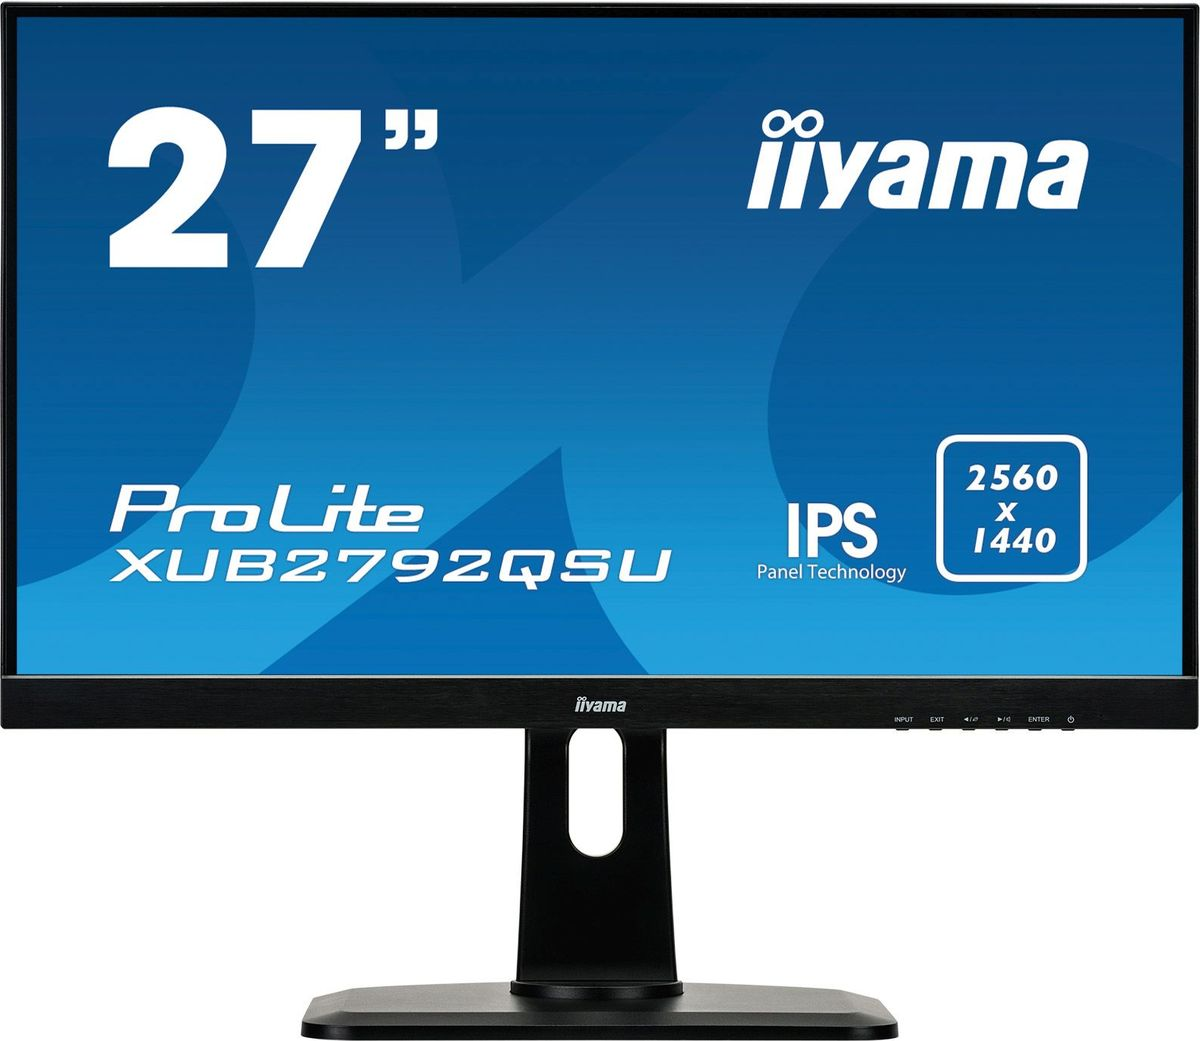 iiyama XUB2792QSU-B1, Black мониторXUB2792QSU-B127 ULTRA SLIM LINE, 2560x1440 WQHD, IPS-panel, 5ms, FreeSync, 13cm height adj. stand, 350cd/m?, >12mlnln:1 ACR, VGA, HDMI, DisplayPort, Speakers, USB-HUB(2x3.0), TCO6